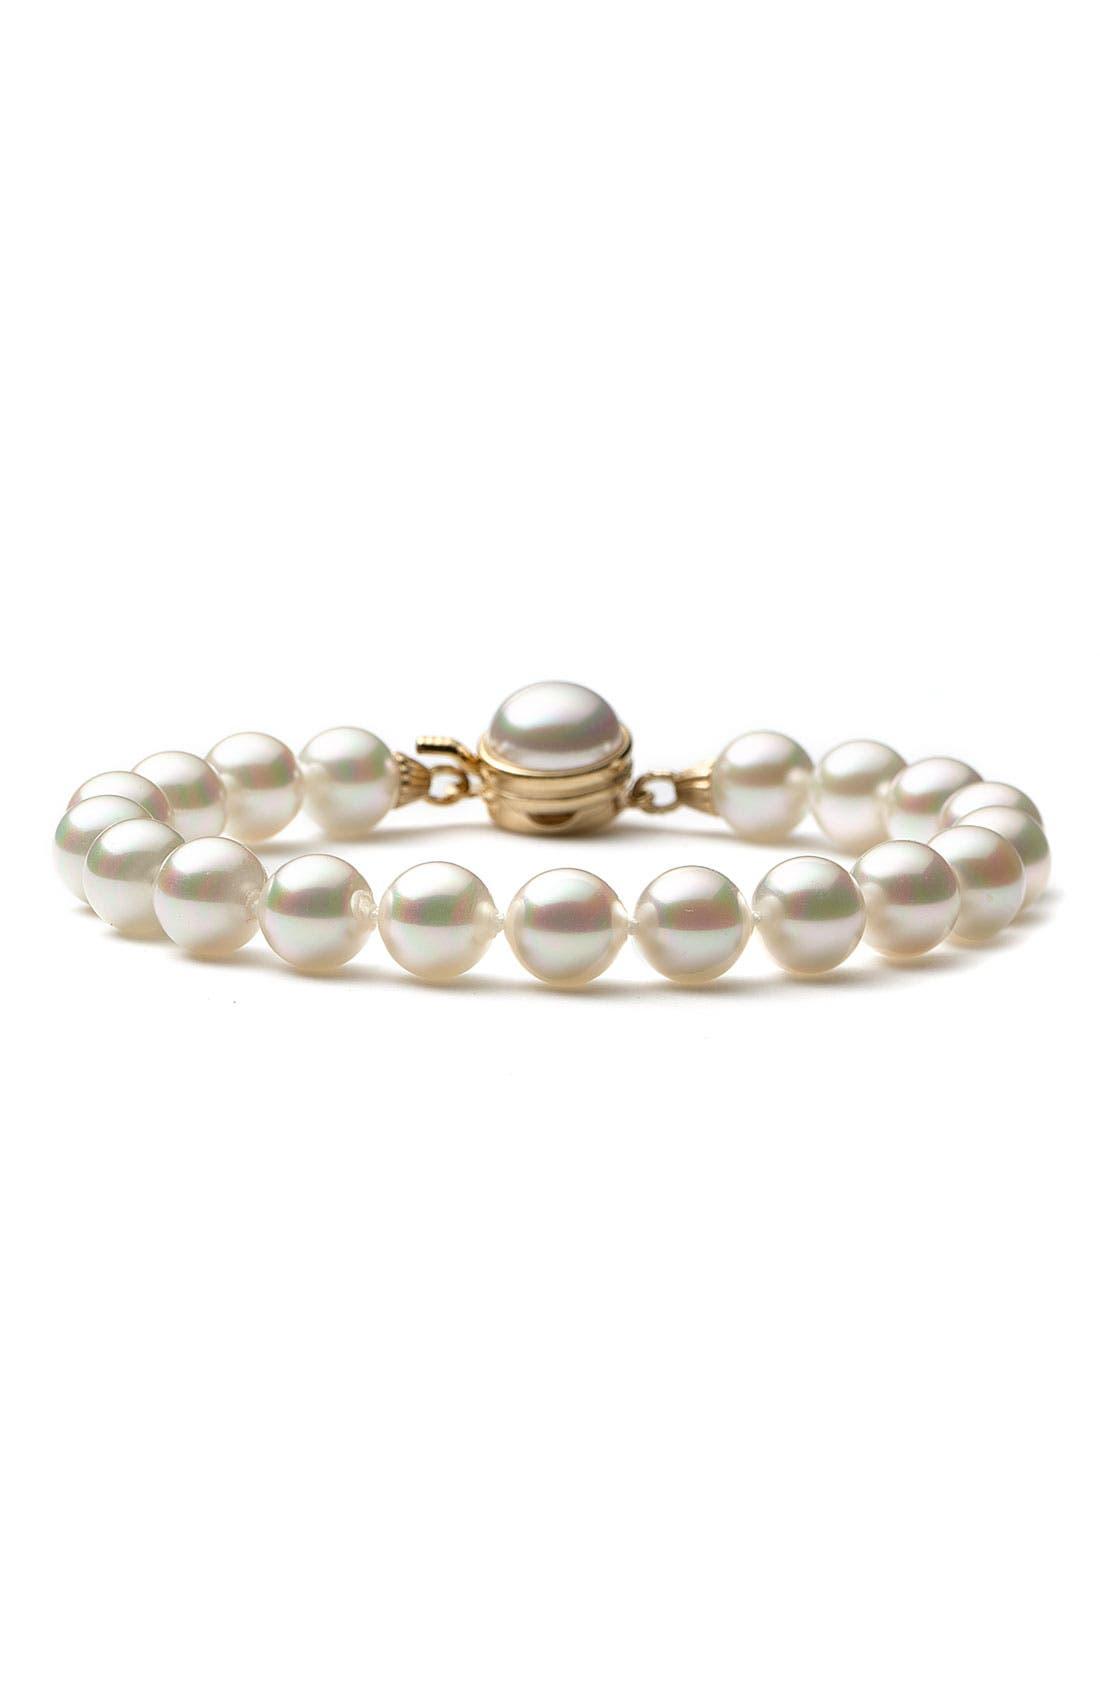 8mm Single Row Pearl Bracelet,                             Alternate thumbnail 3, color,                             WHITE/ GOLD